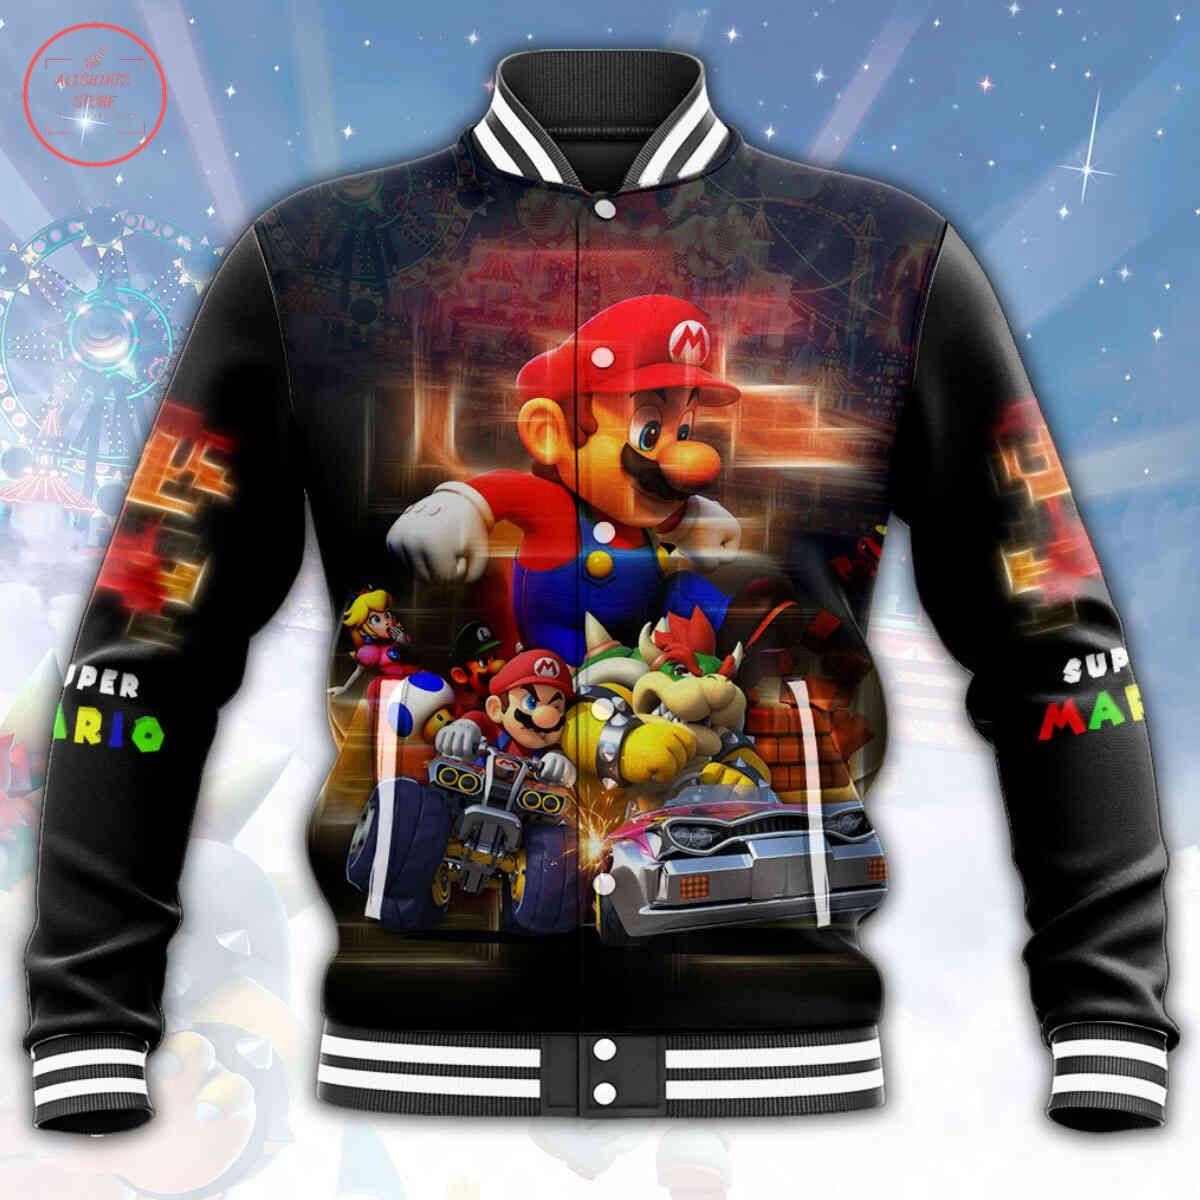 Super Mario All Over Print Letterman Jacket